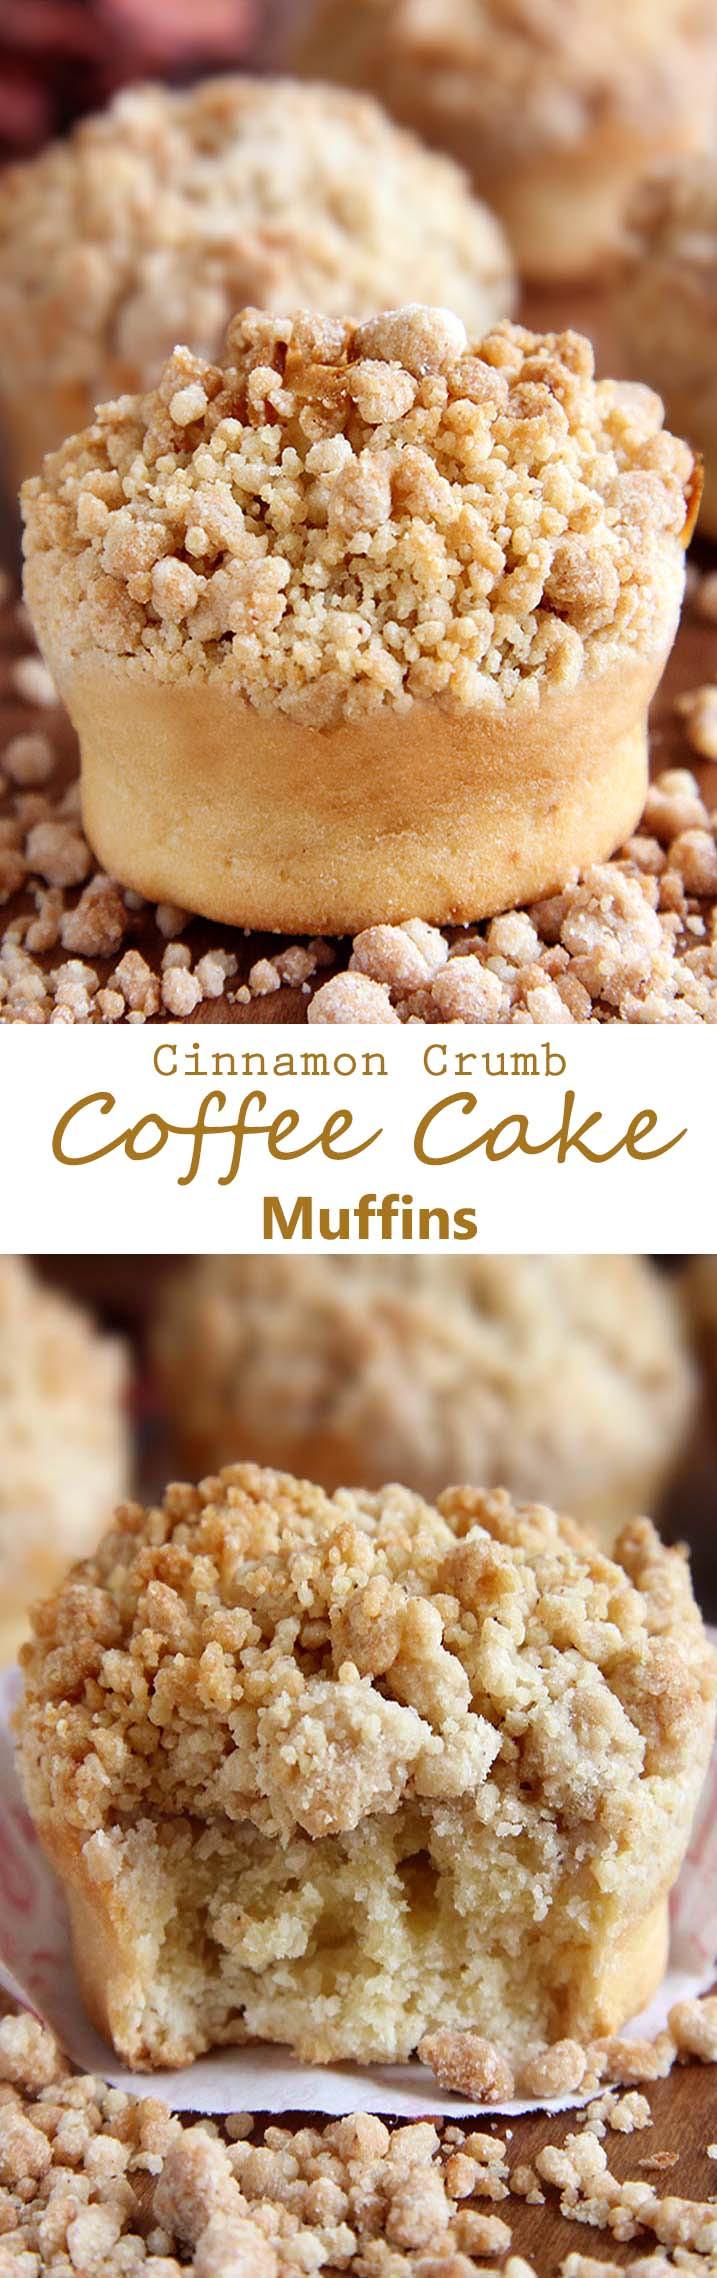 Coffee Cake Muffins  Cinnamon Crumb Coffee Cake Muffins Sugar Apron